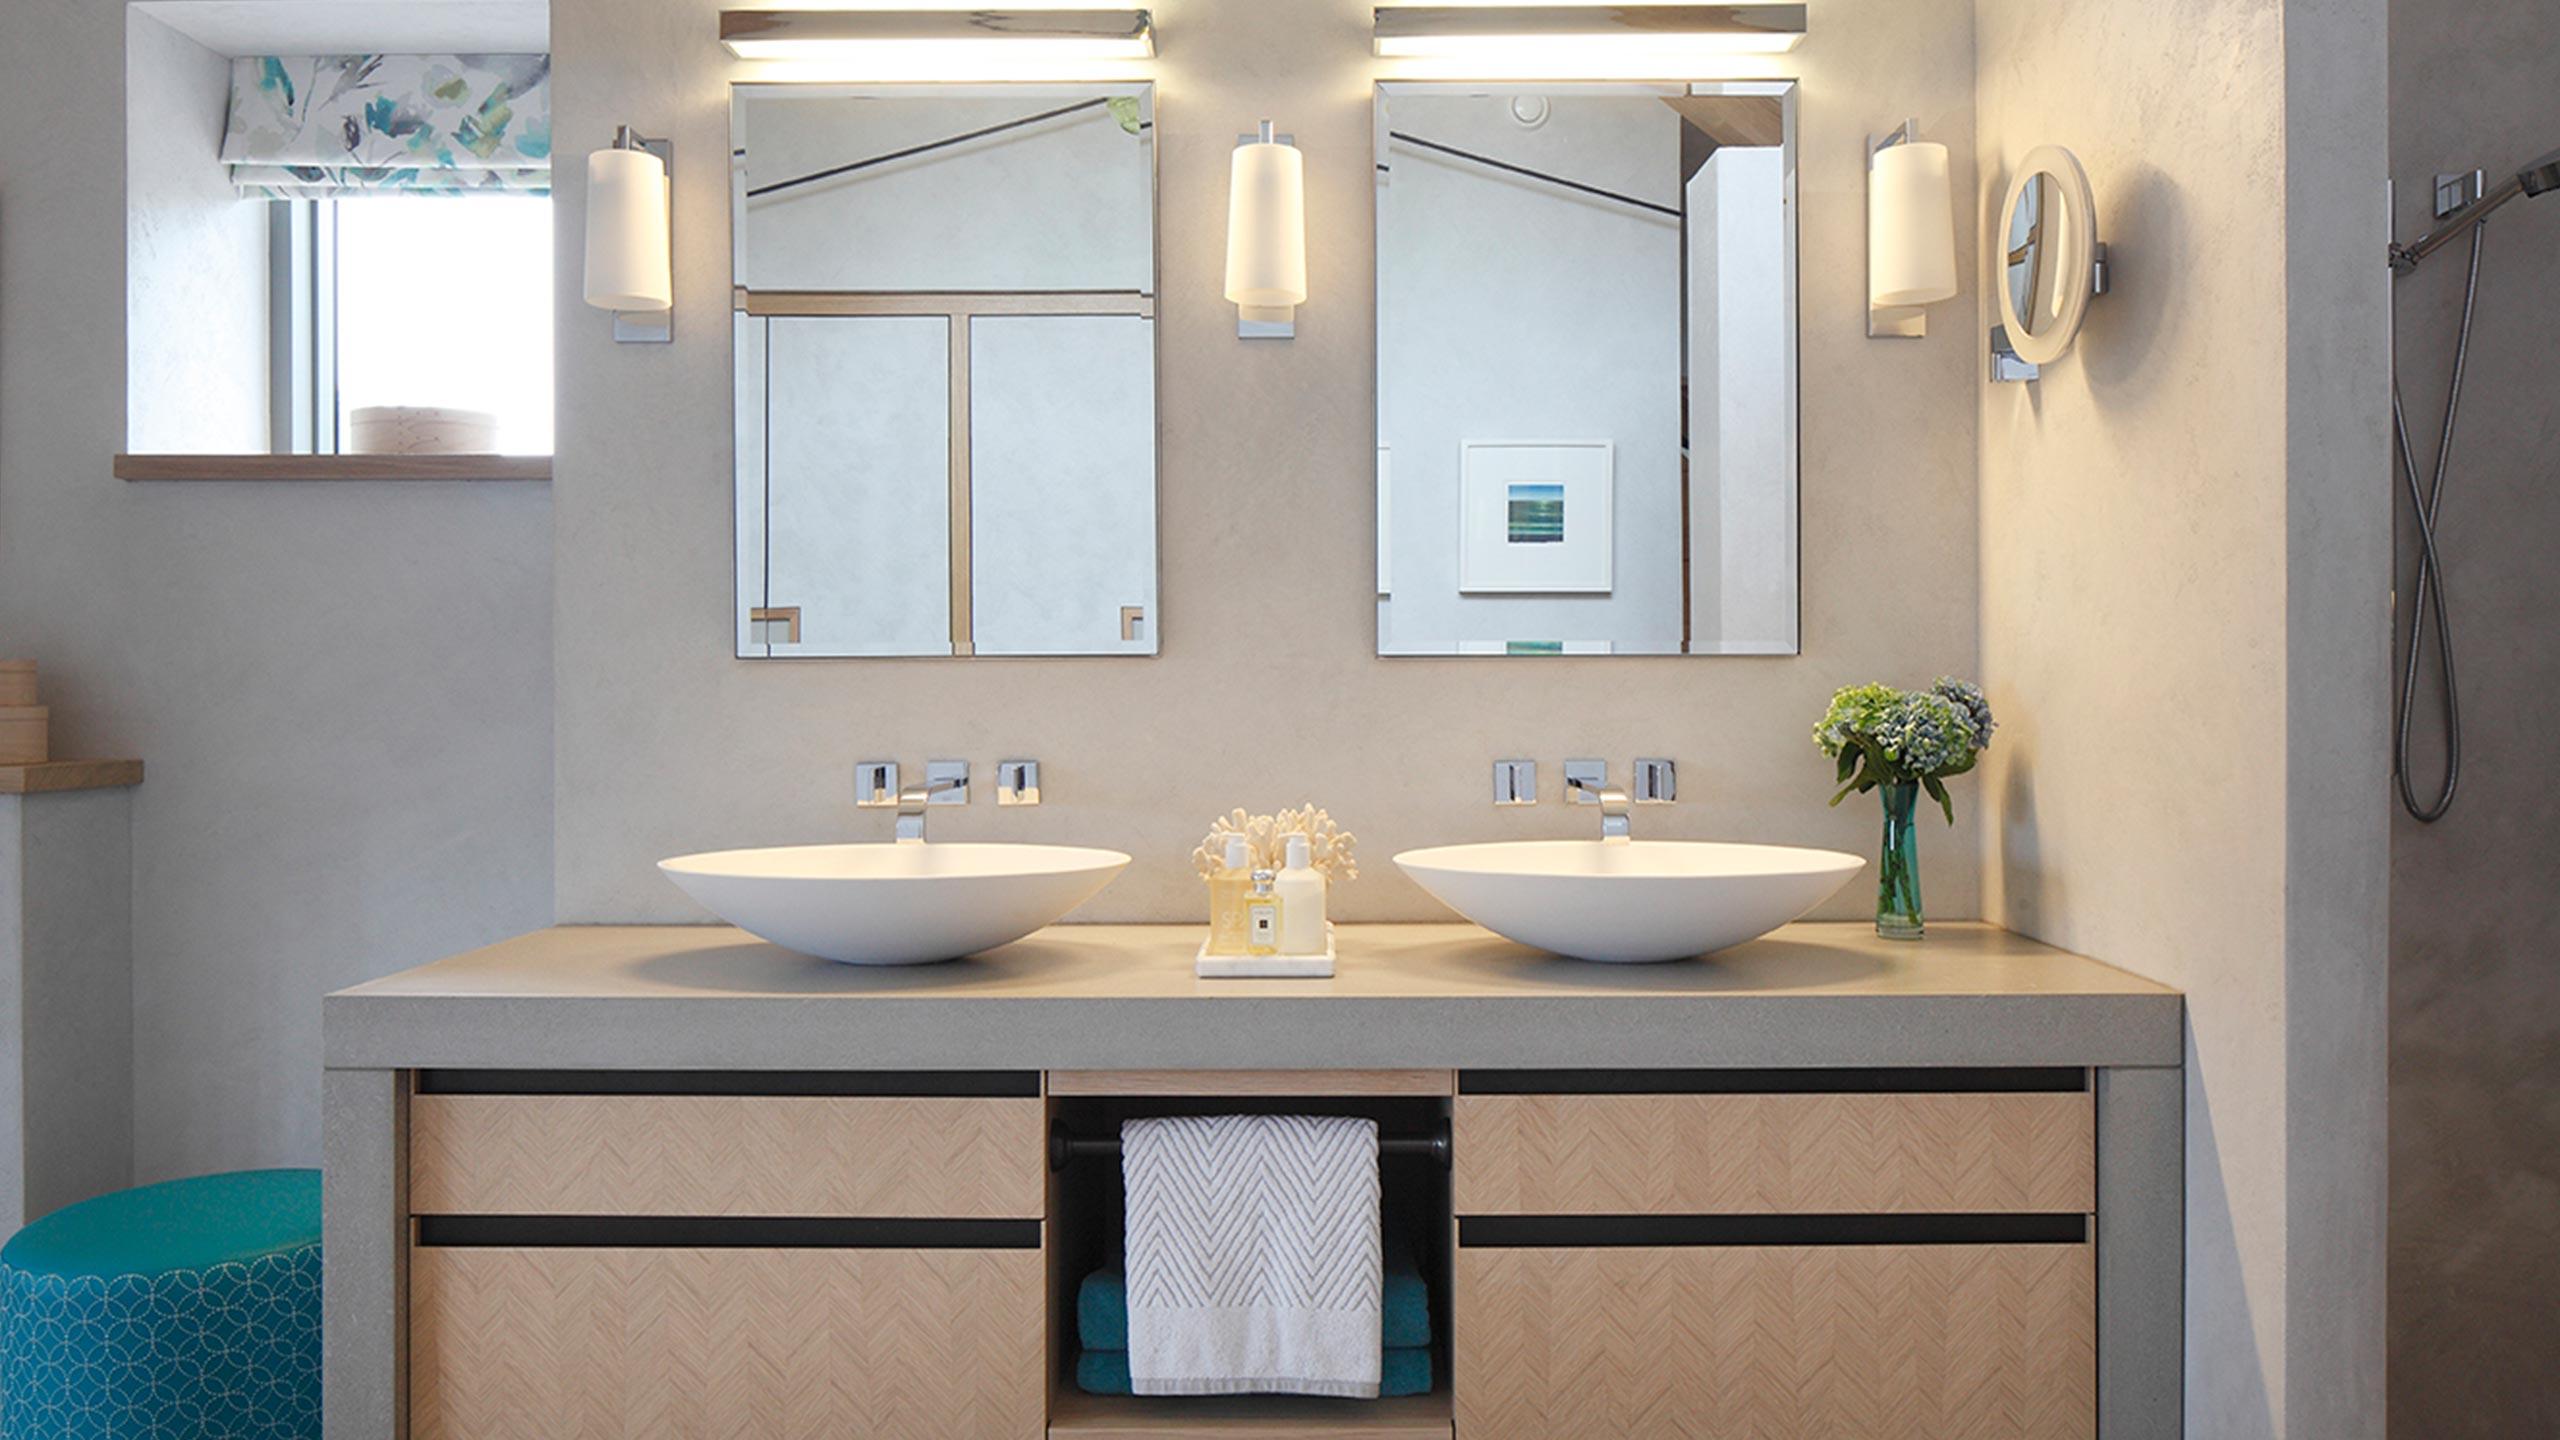 Joinery installation bathroom by Neova Installation.